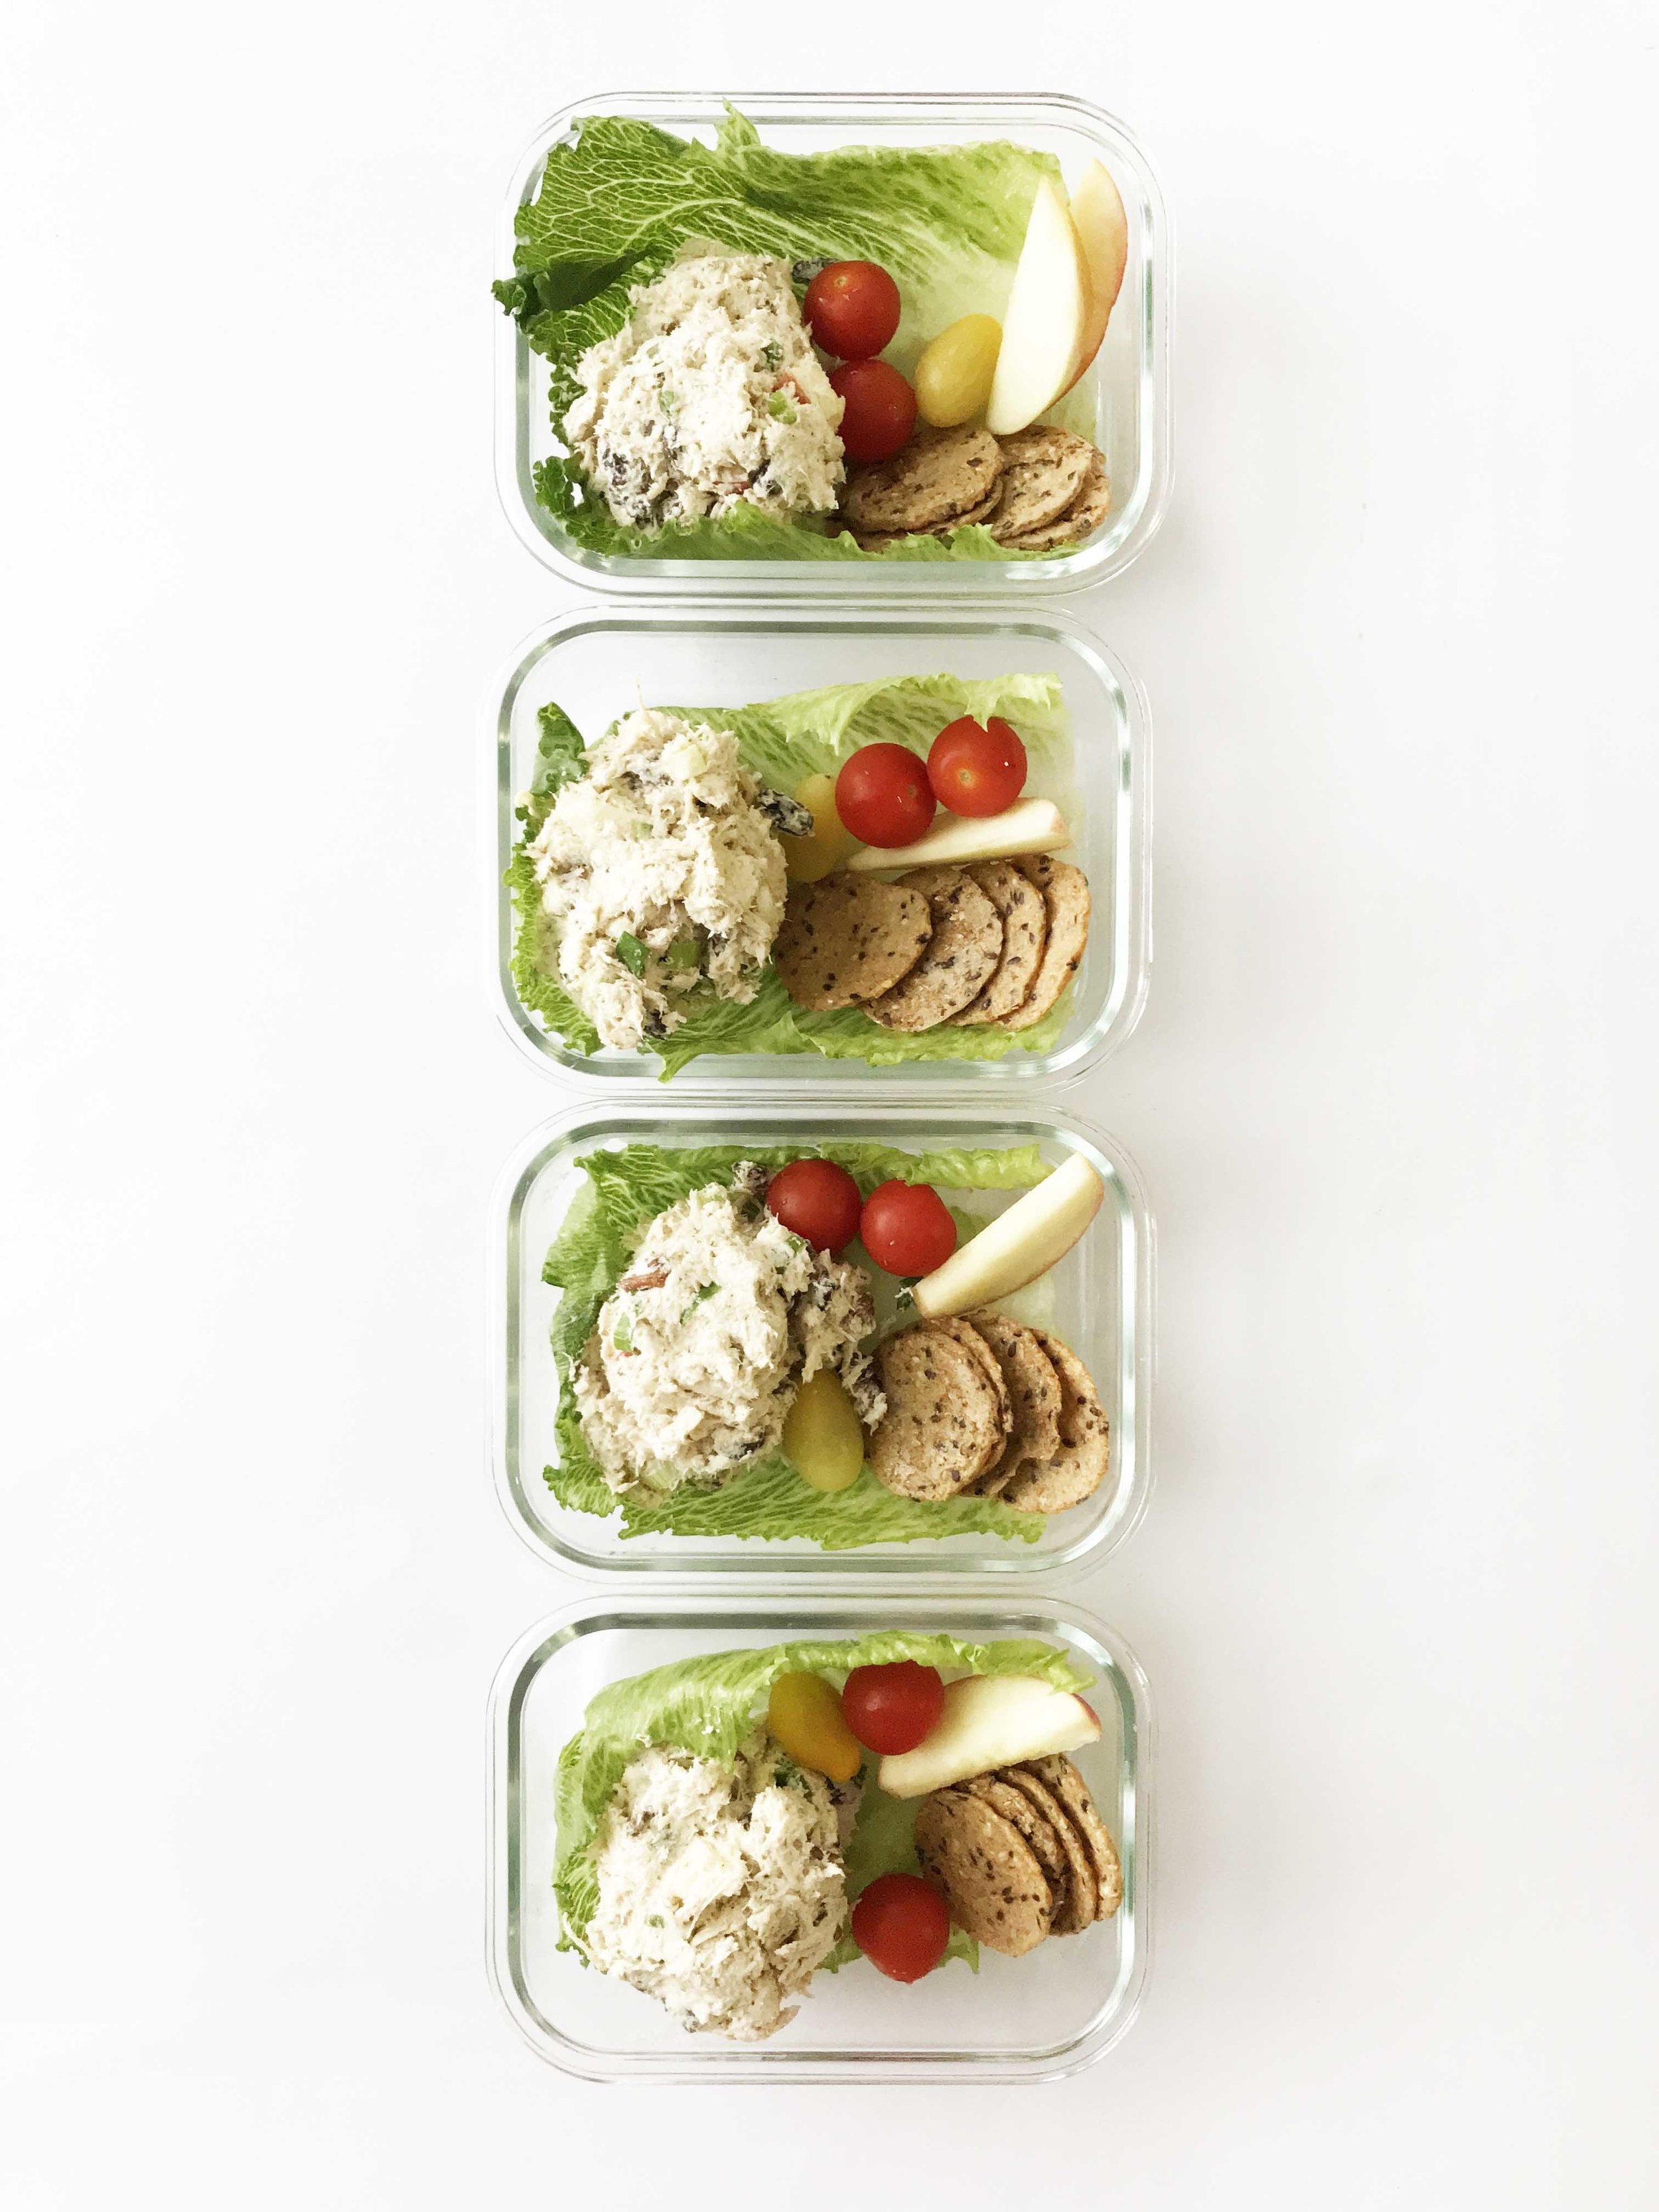 chicken-salad-lunch-box3.jpg